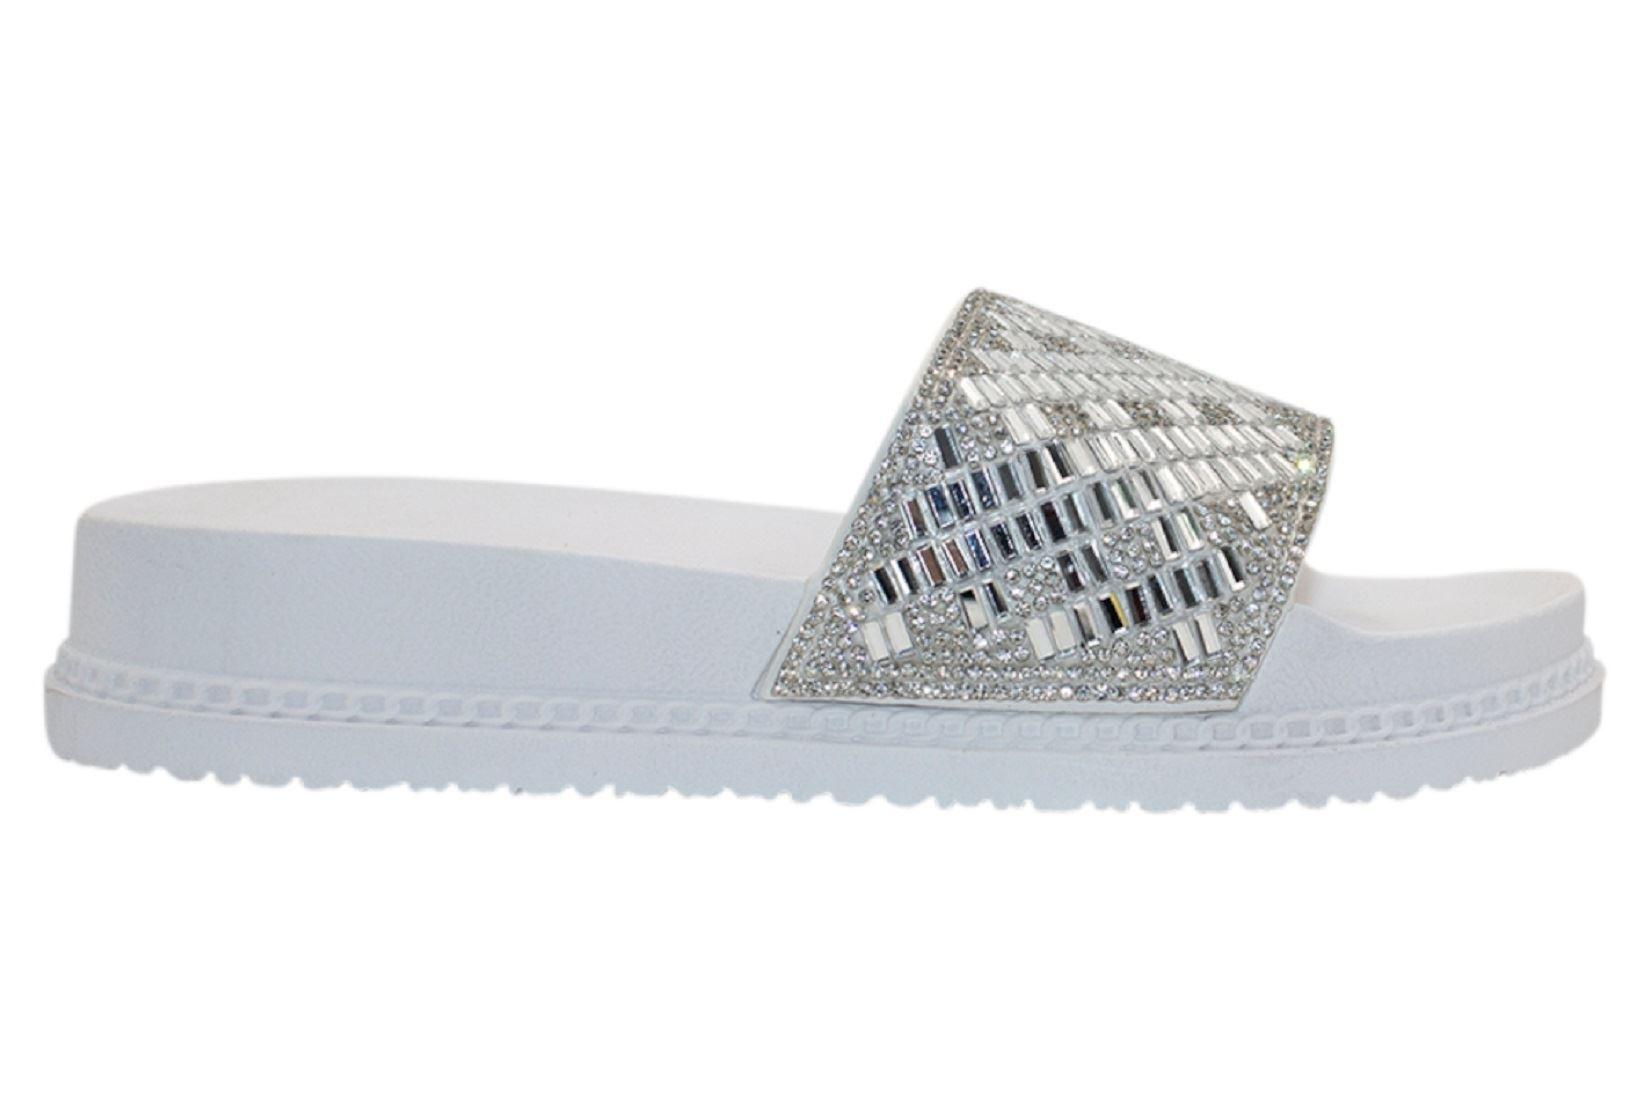 Womens-Sliders-Casual-Slippers-Mules-Ladies-Diamante-Flip-Flop-Sandals-Shoes thumbnail 92